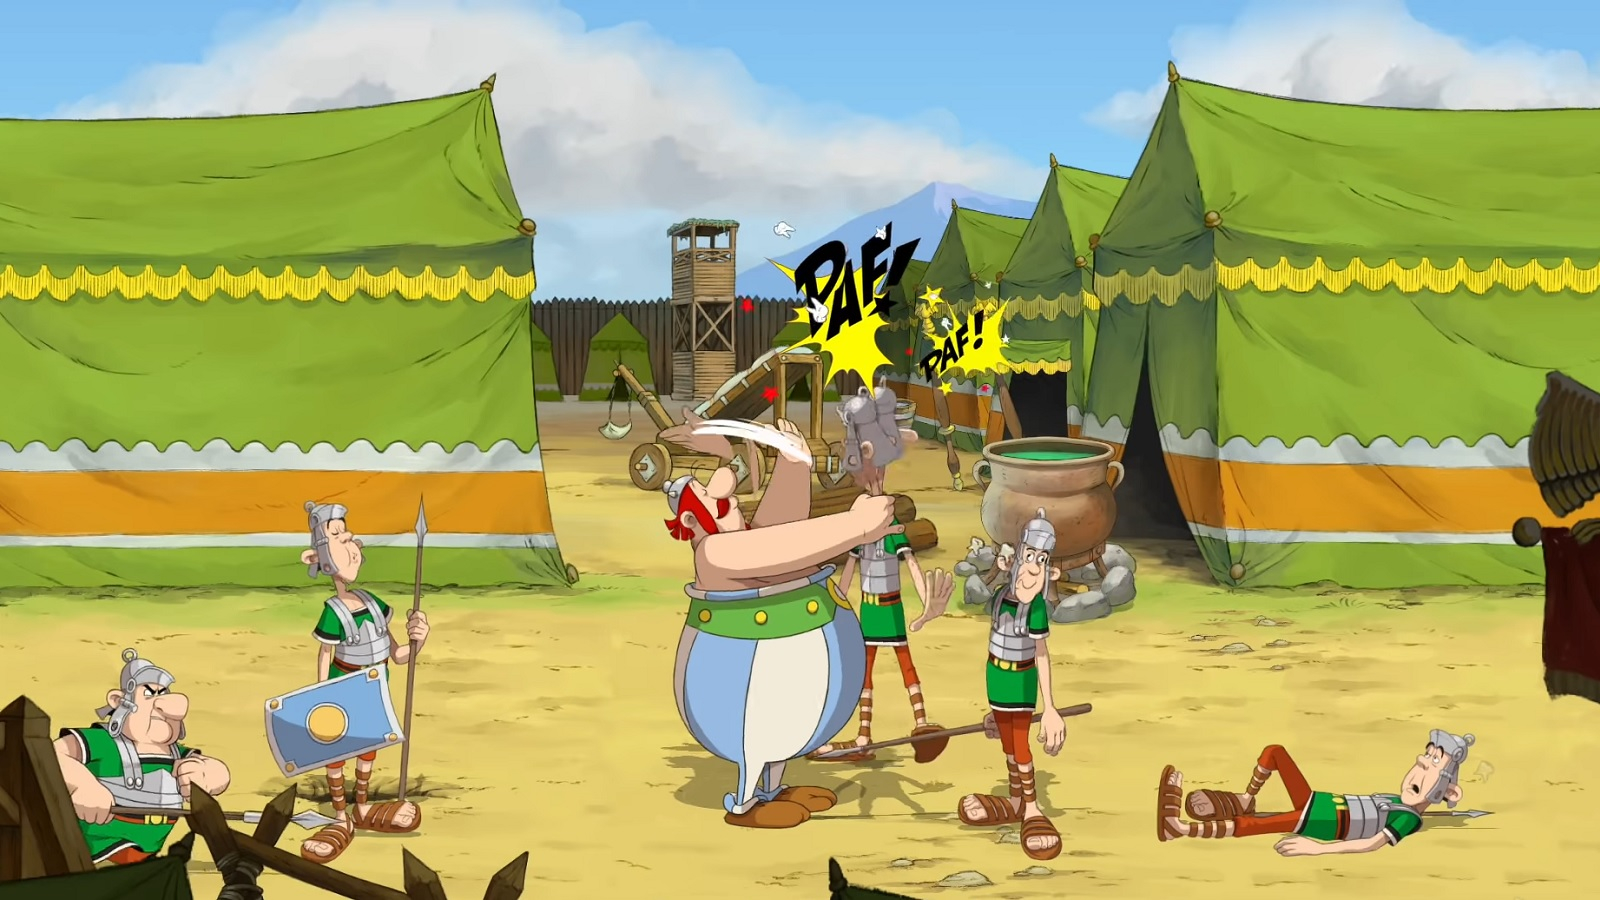 Microids выпустит новую игру про Астерикса и Обеликса  Asterix & Obelix: Slap Them All!